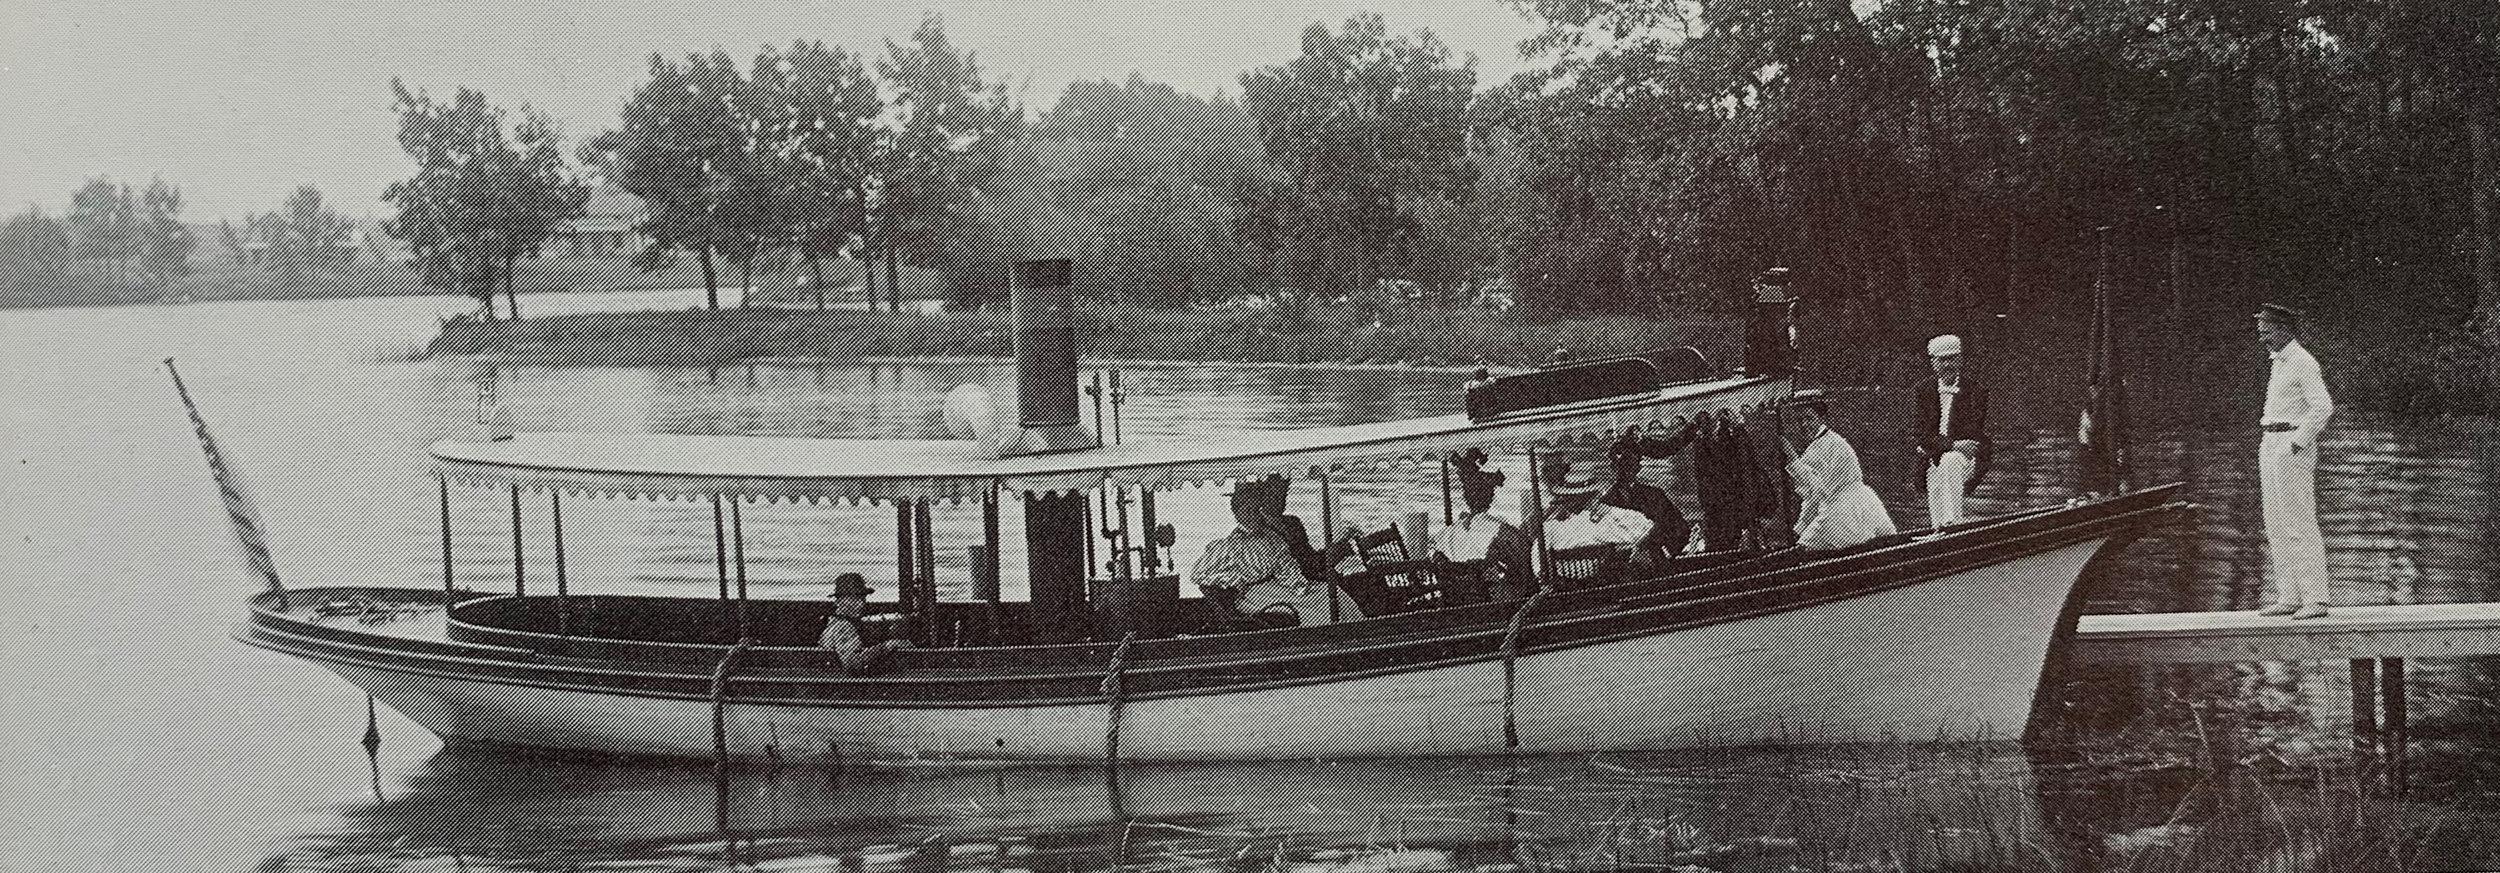 Lake_Beulah_History_LBYC-007.jpg